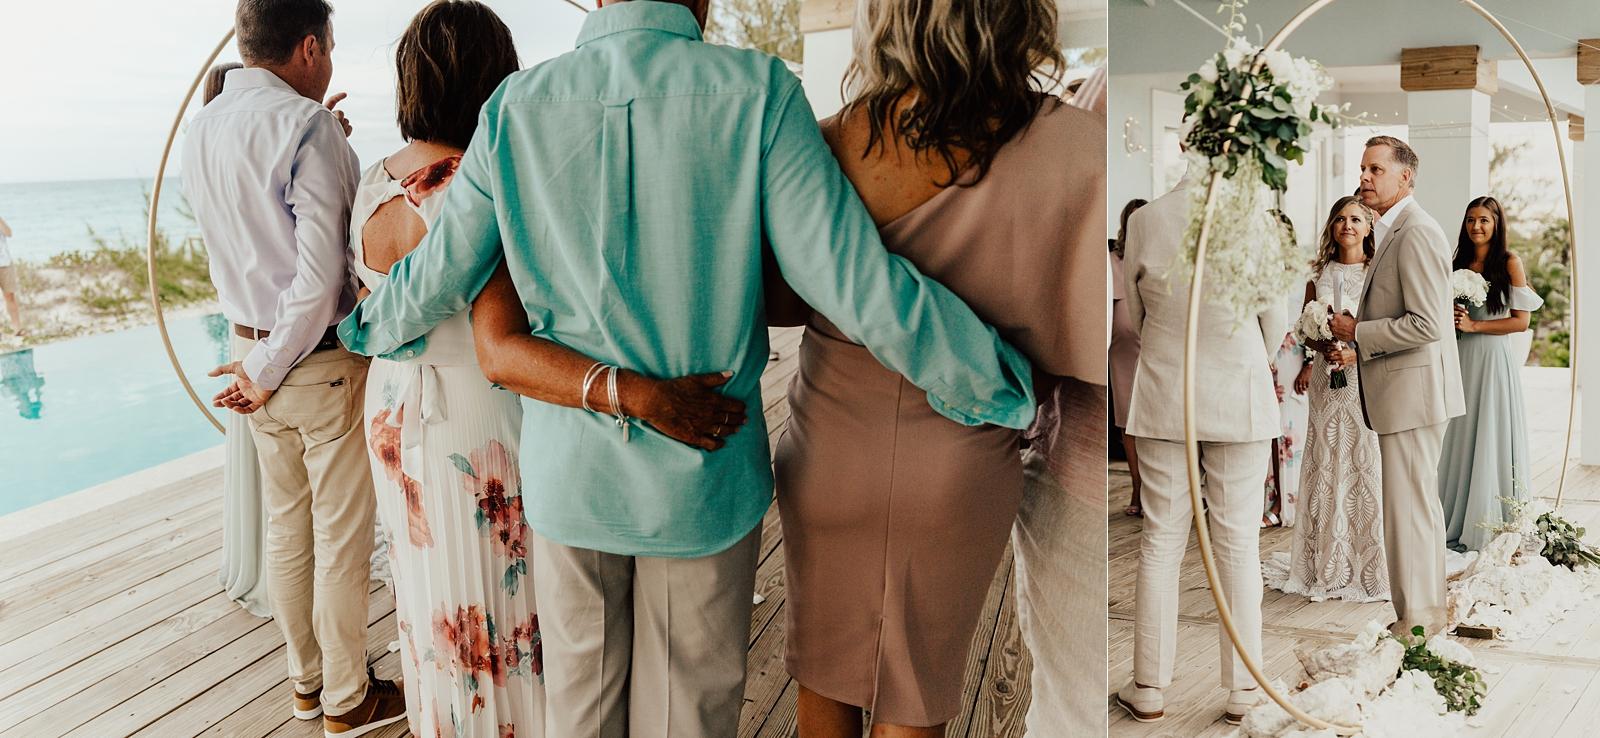 Jenni & Andrew Intimate Beach Destination Wedding in Little Exuma, Bahamas_0507.jpg